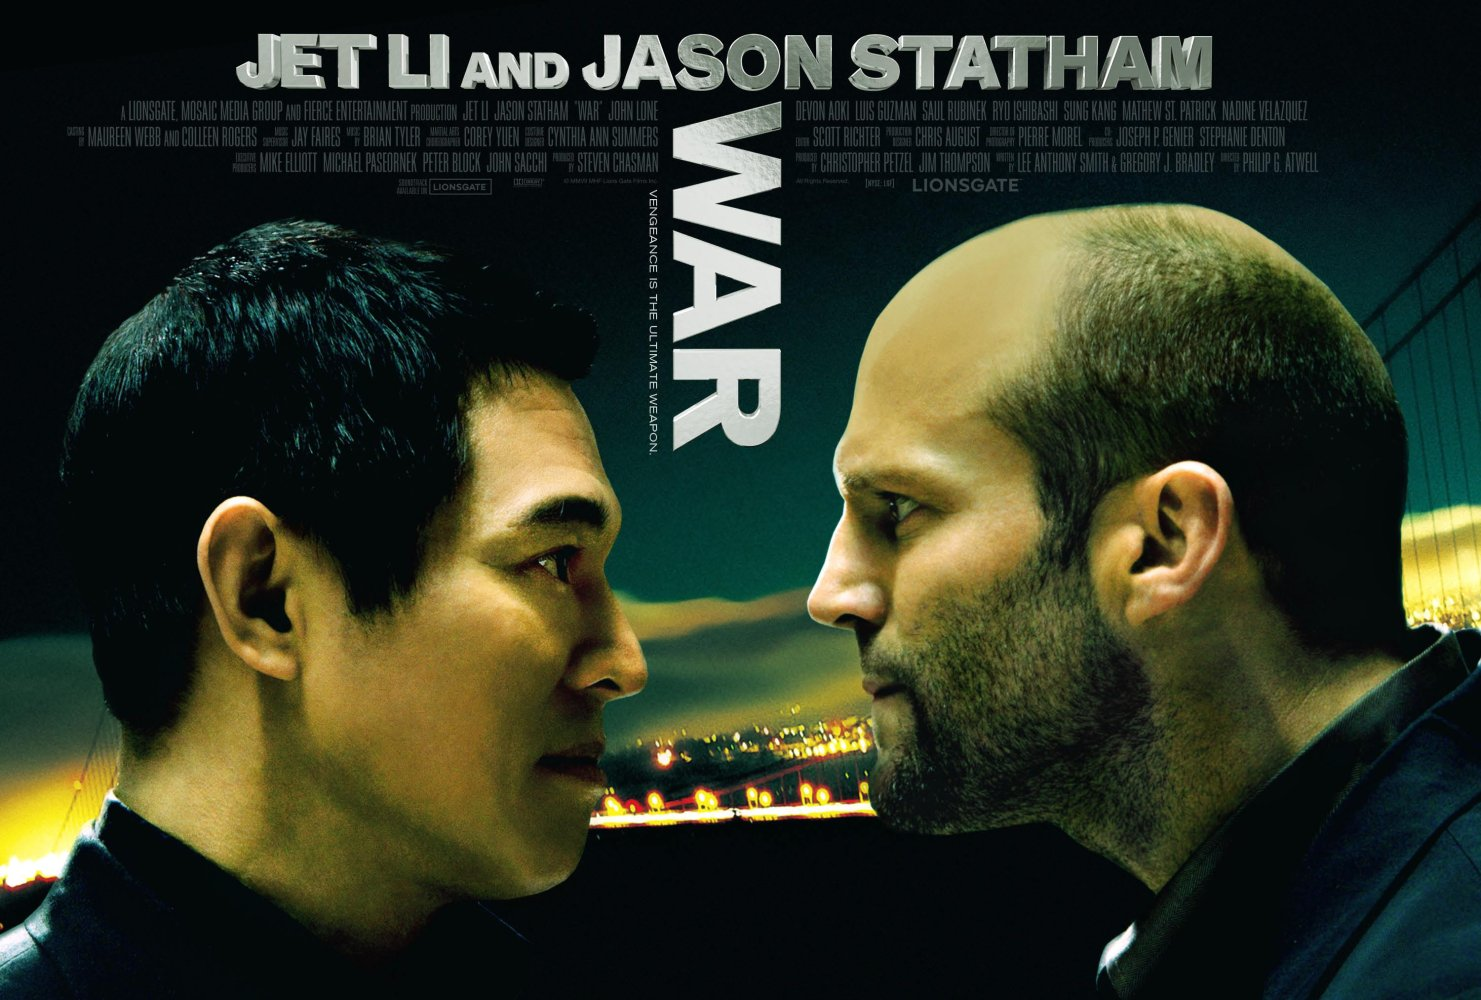 Movie Posters 2007: MoviePosterAddict